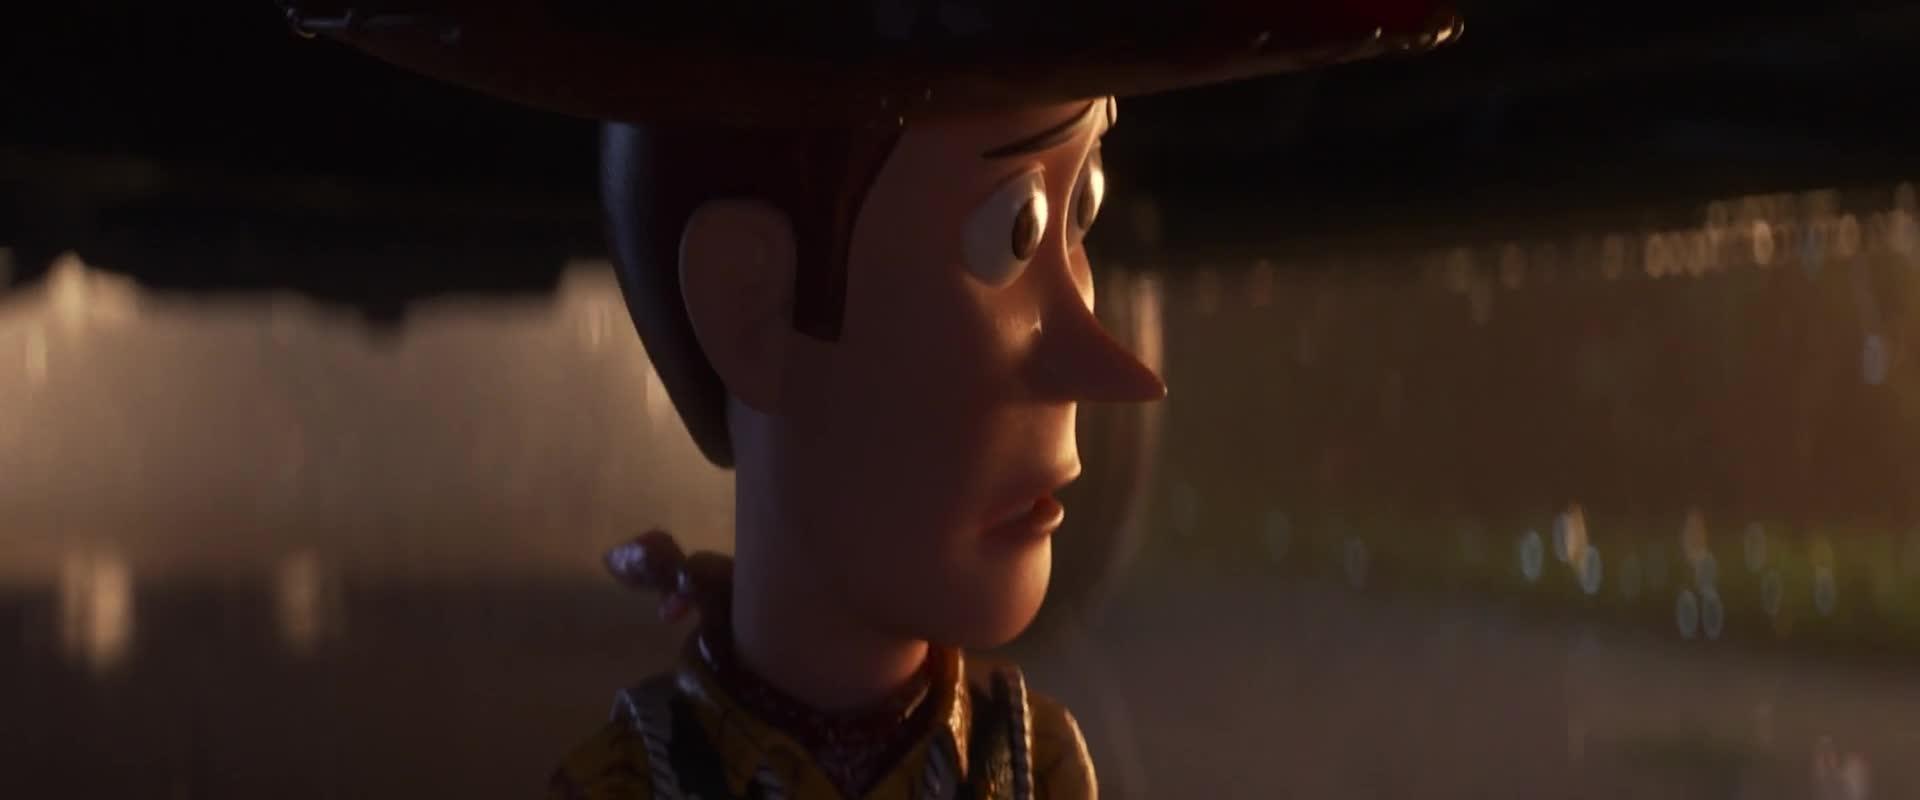 Toy Story 4 Pribeh hracek 2019 CZ titulky